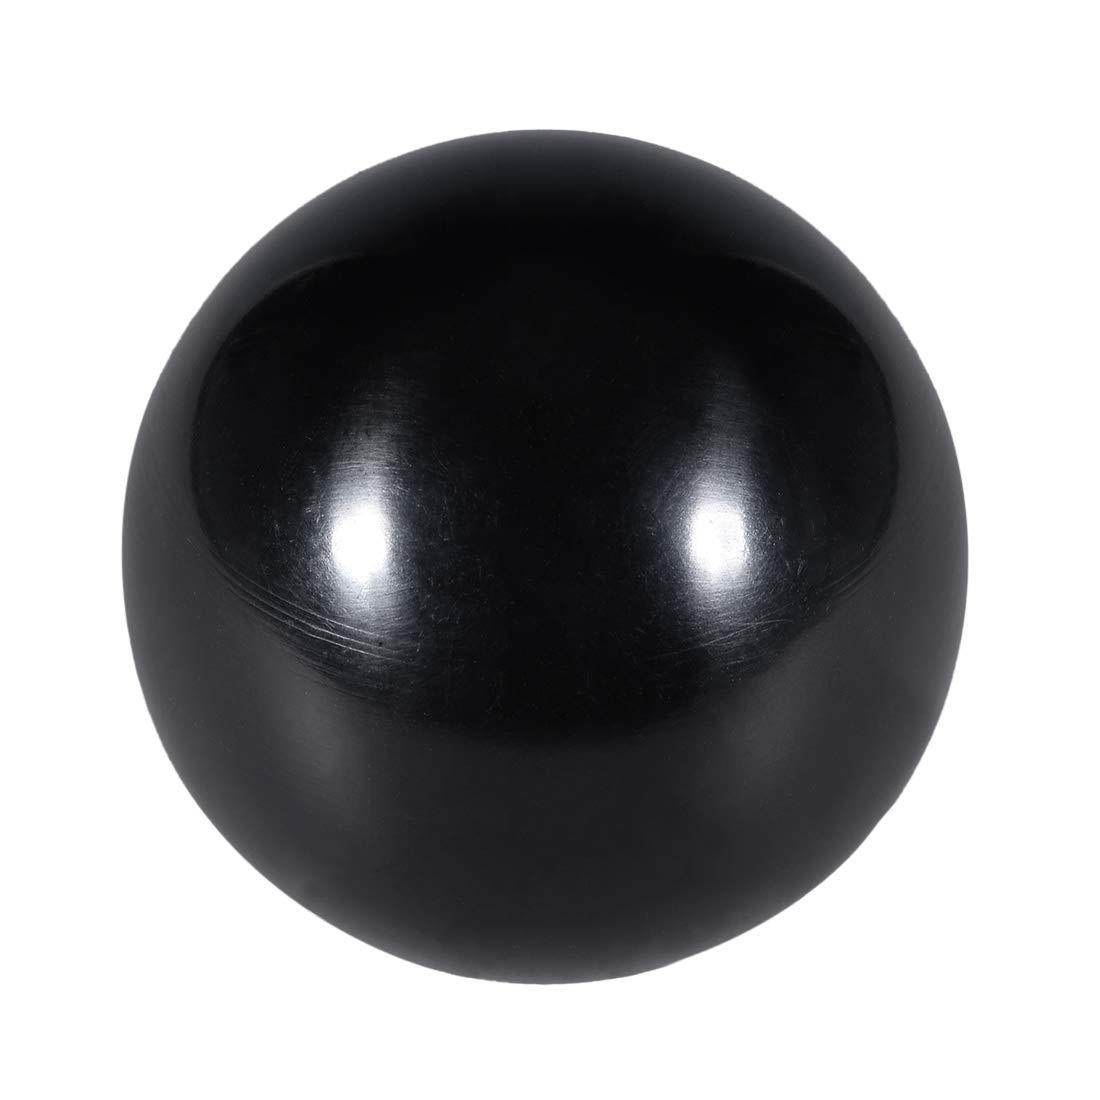 uxcell 15 Pcs Thermoset Ball Knob M10 Female Thread Machine Handle 35mm Diameter Smooth Rim Black